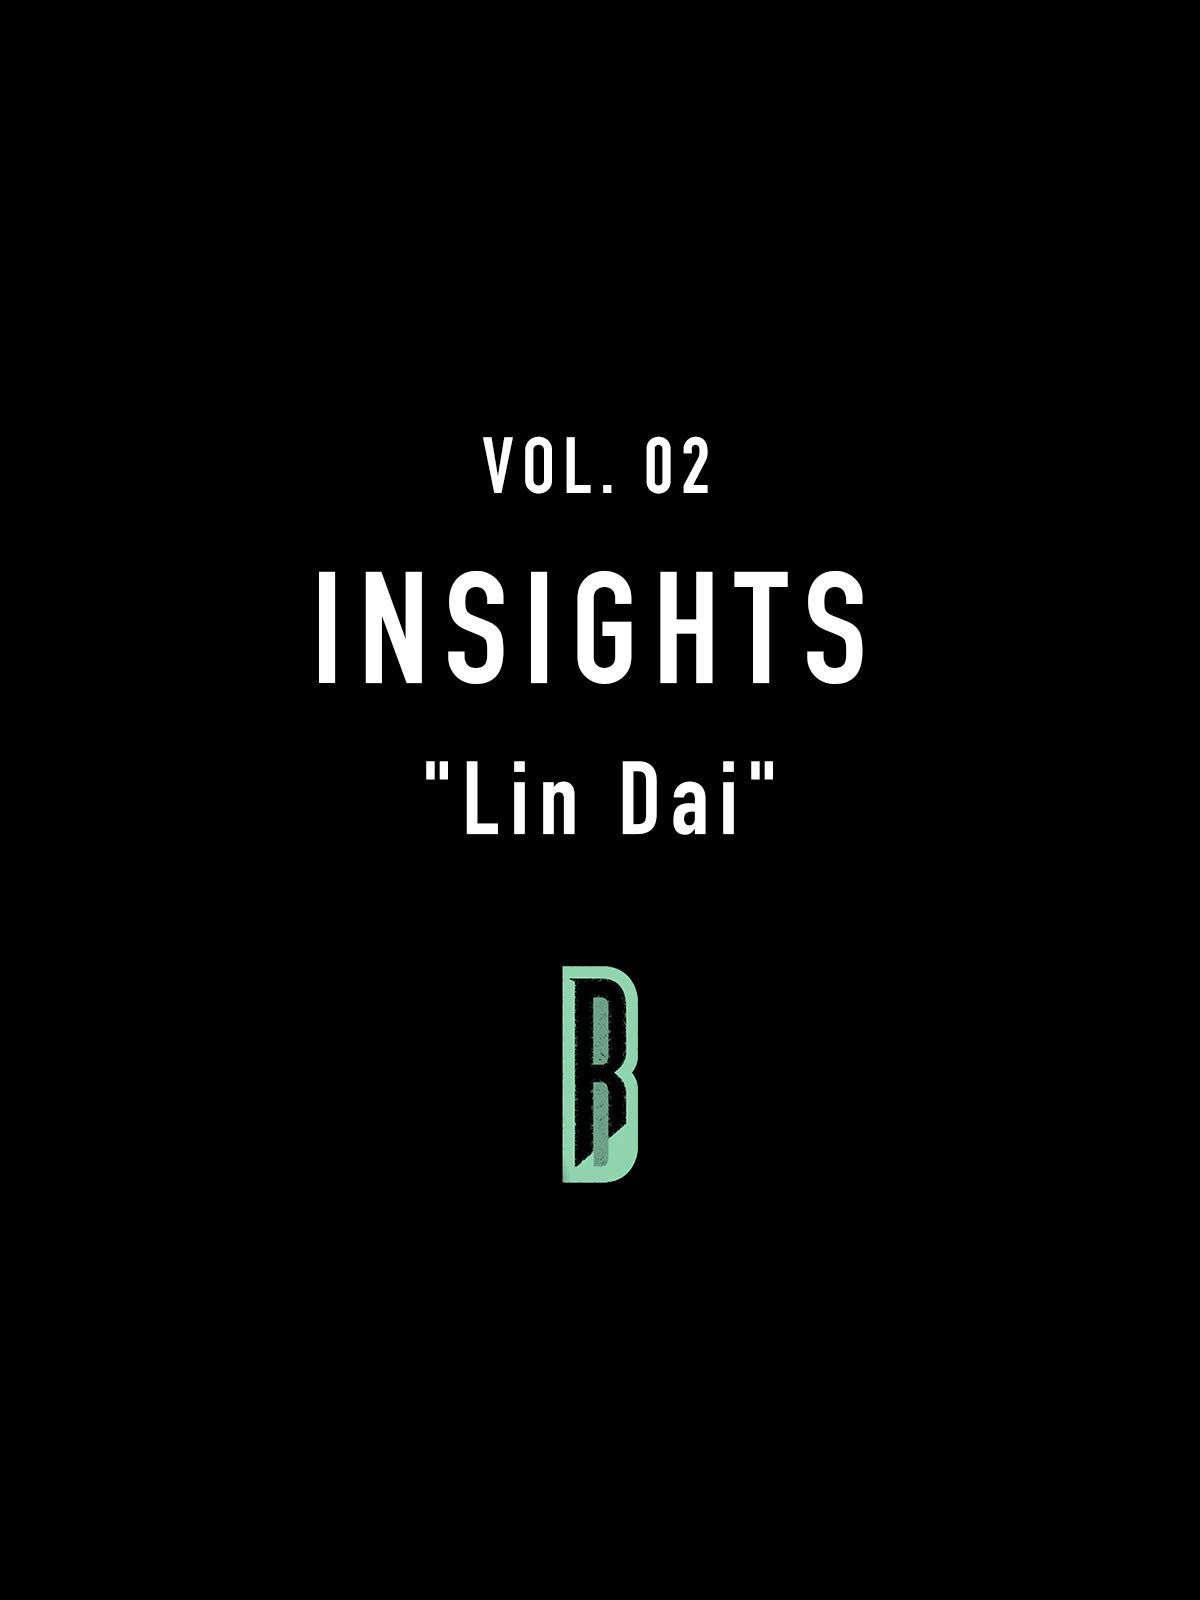 Insights Vol. 02